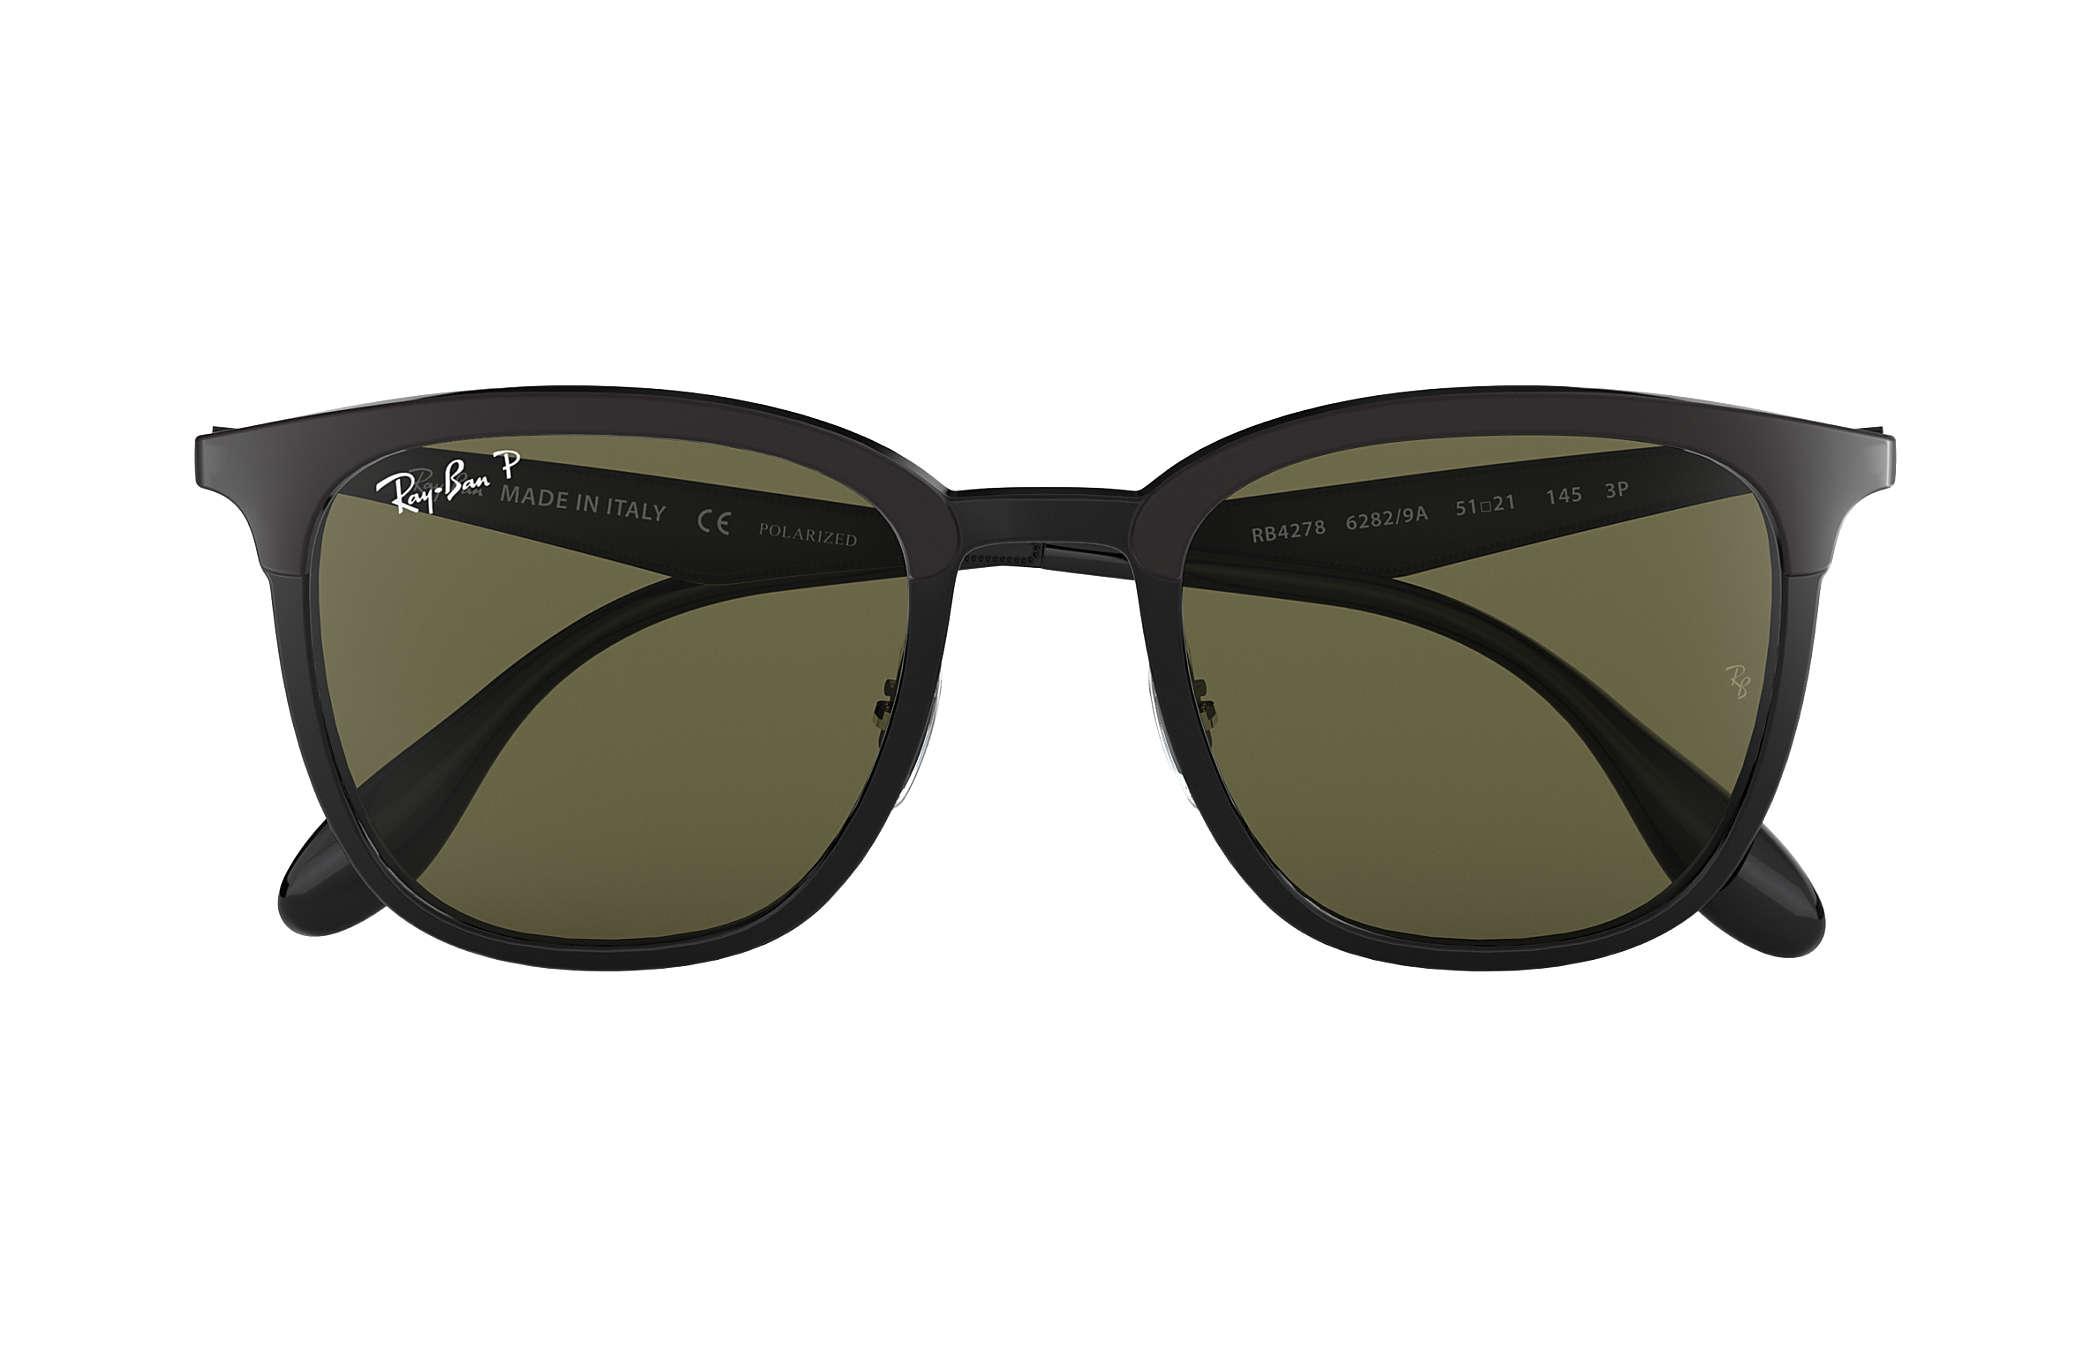 0ca1441bdf8 Ray-Ban RB4278 Black - Injected - Green Polarized Lenses ...